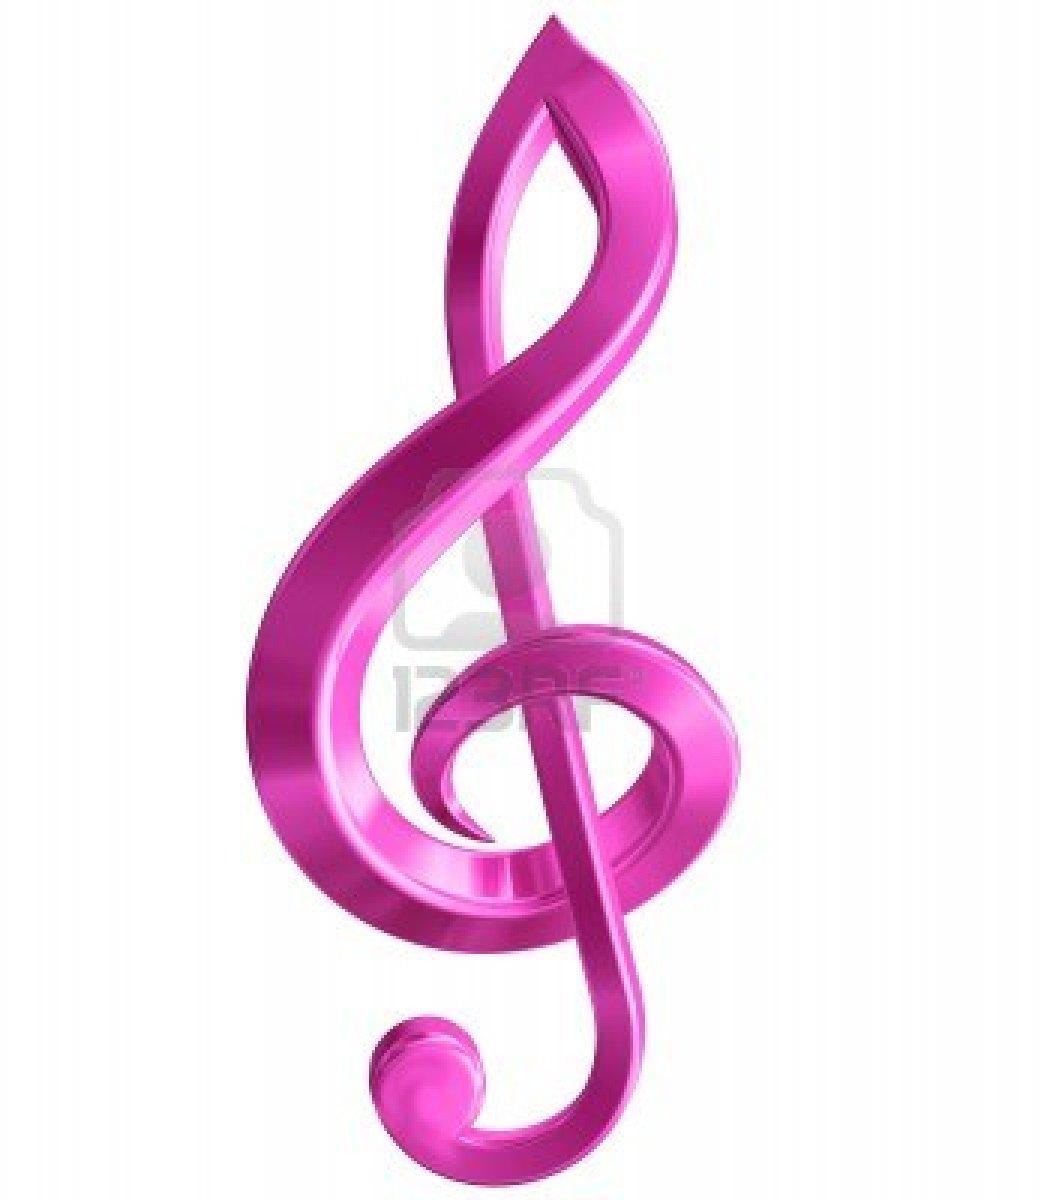 music symbols clipart clip art library free clipart for teachers to use free clipart for teachers pay teachers